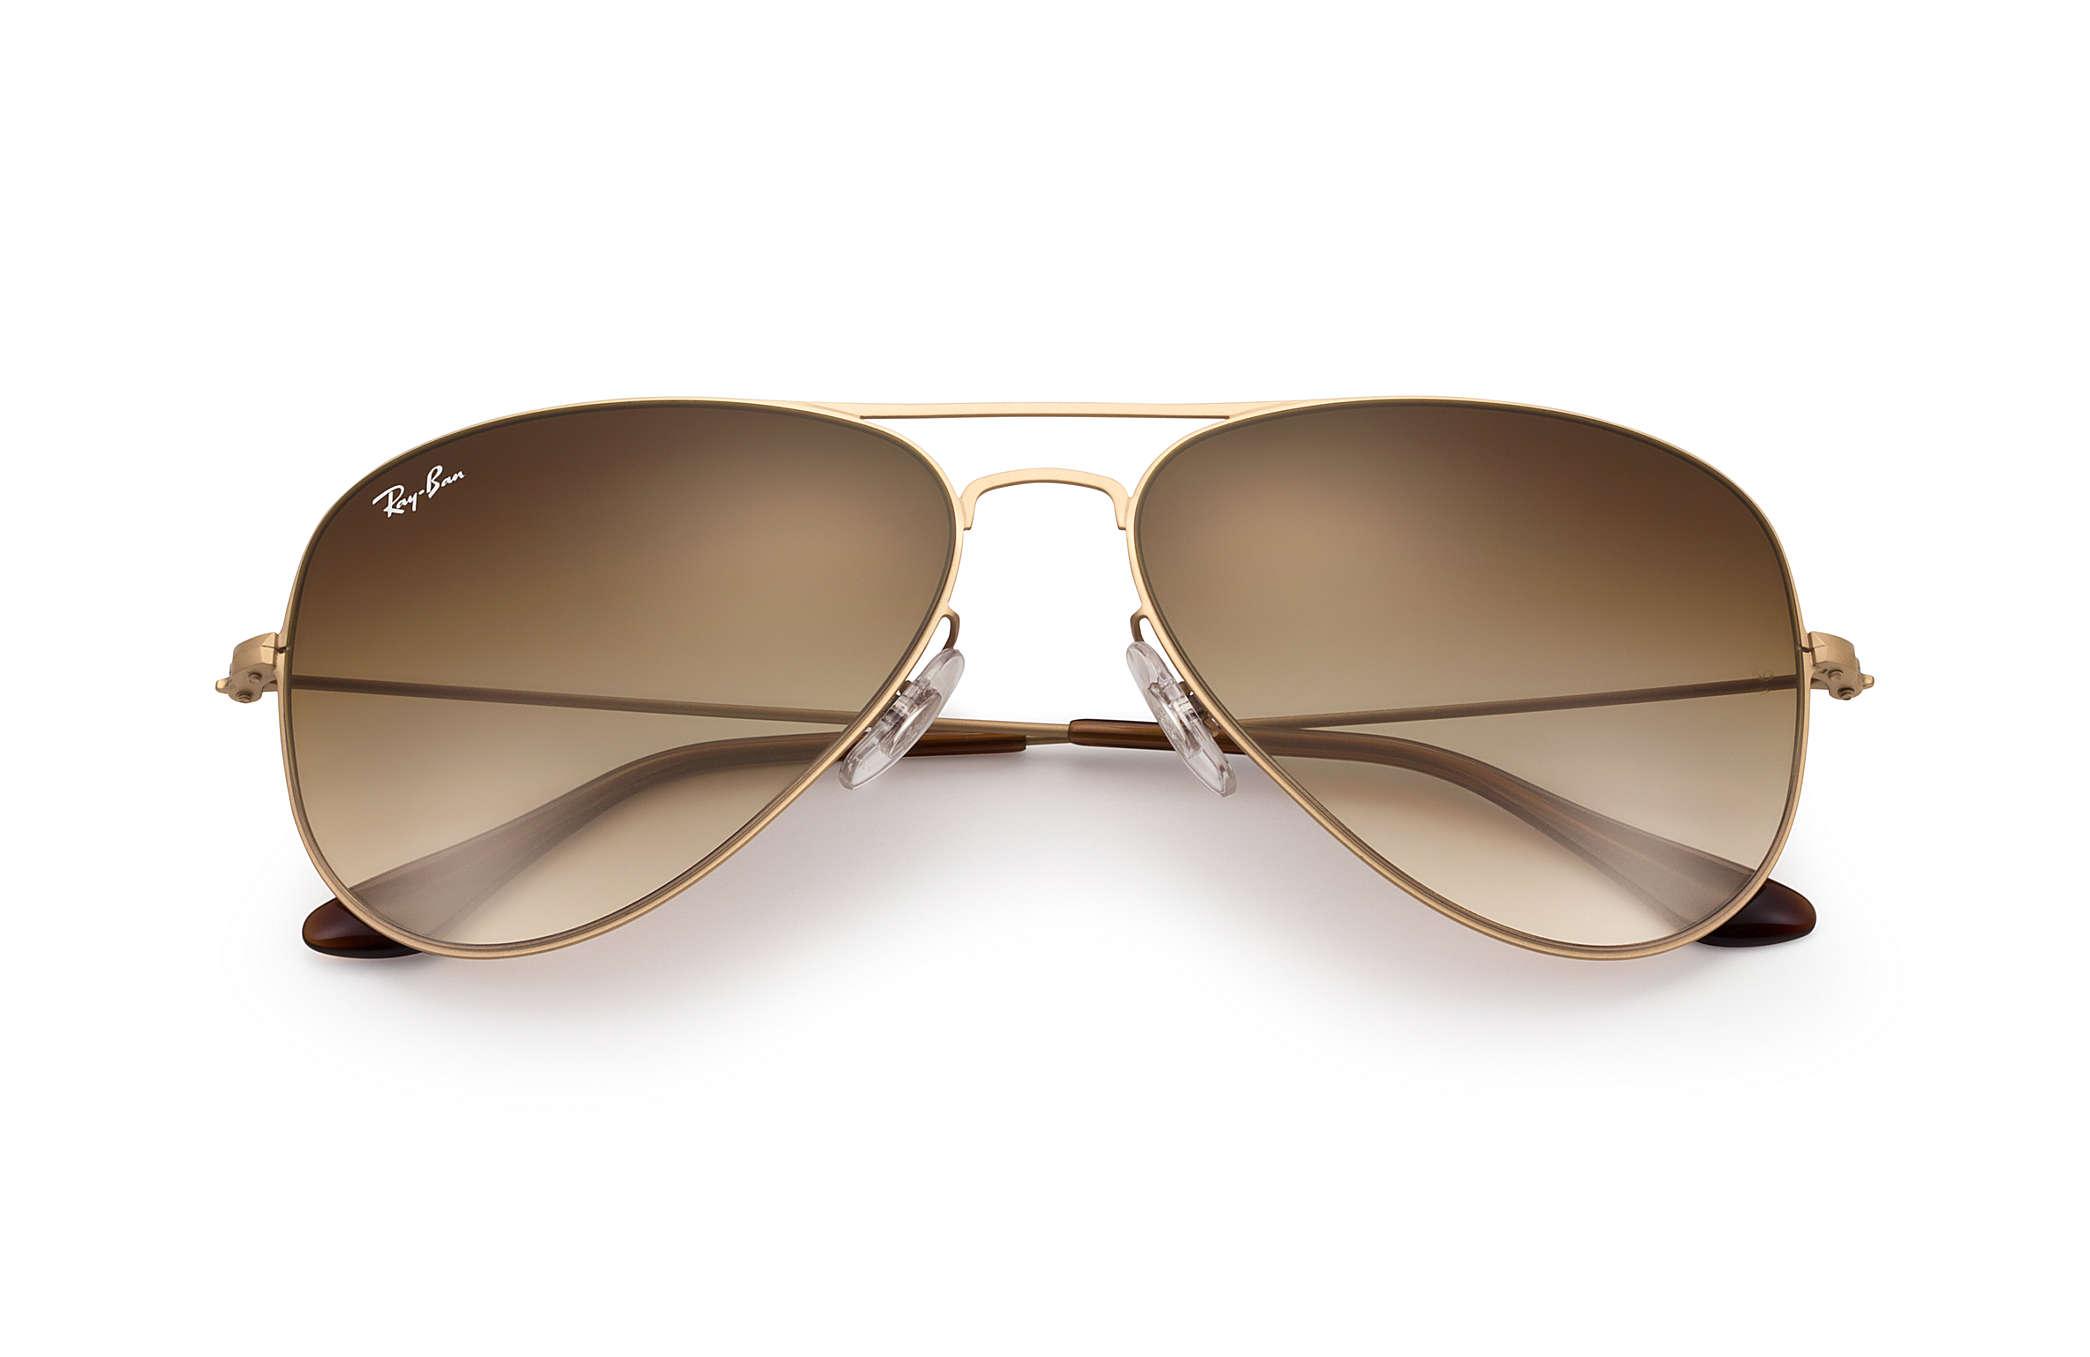 sunglasses oakley outlet williamsburg va 171 heritage malta